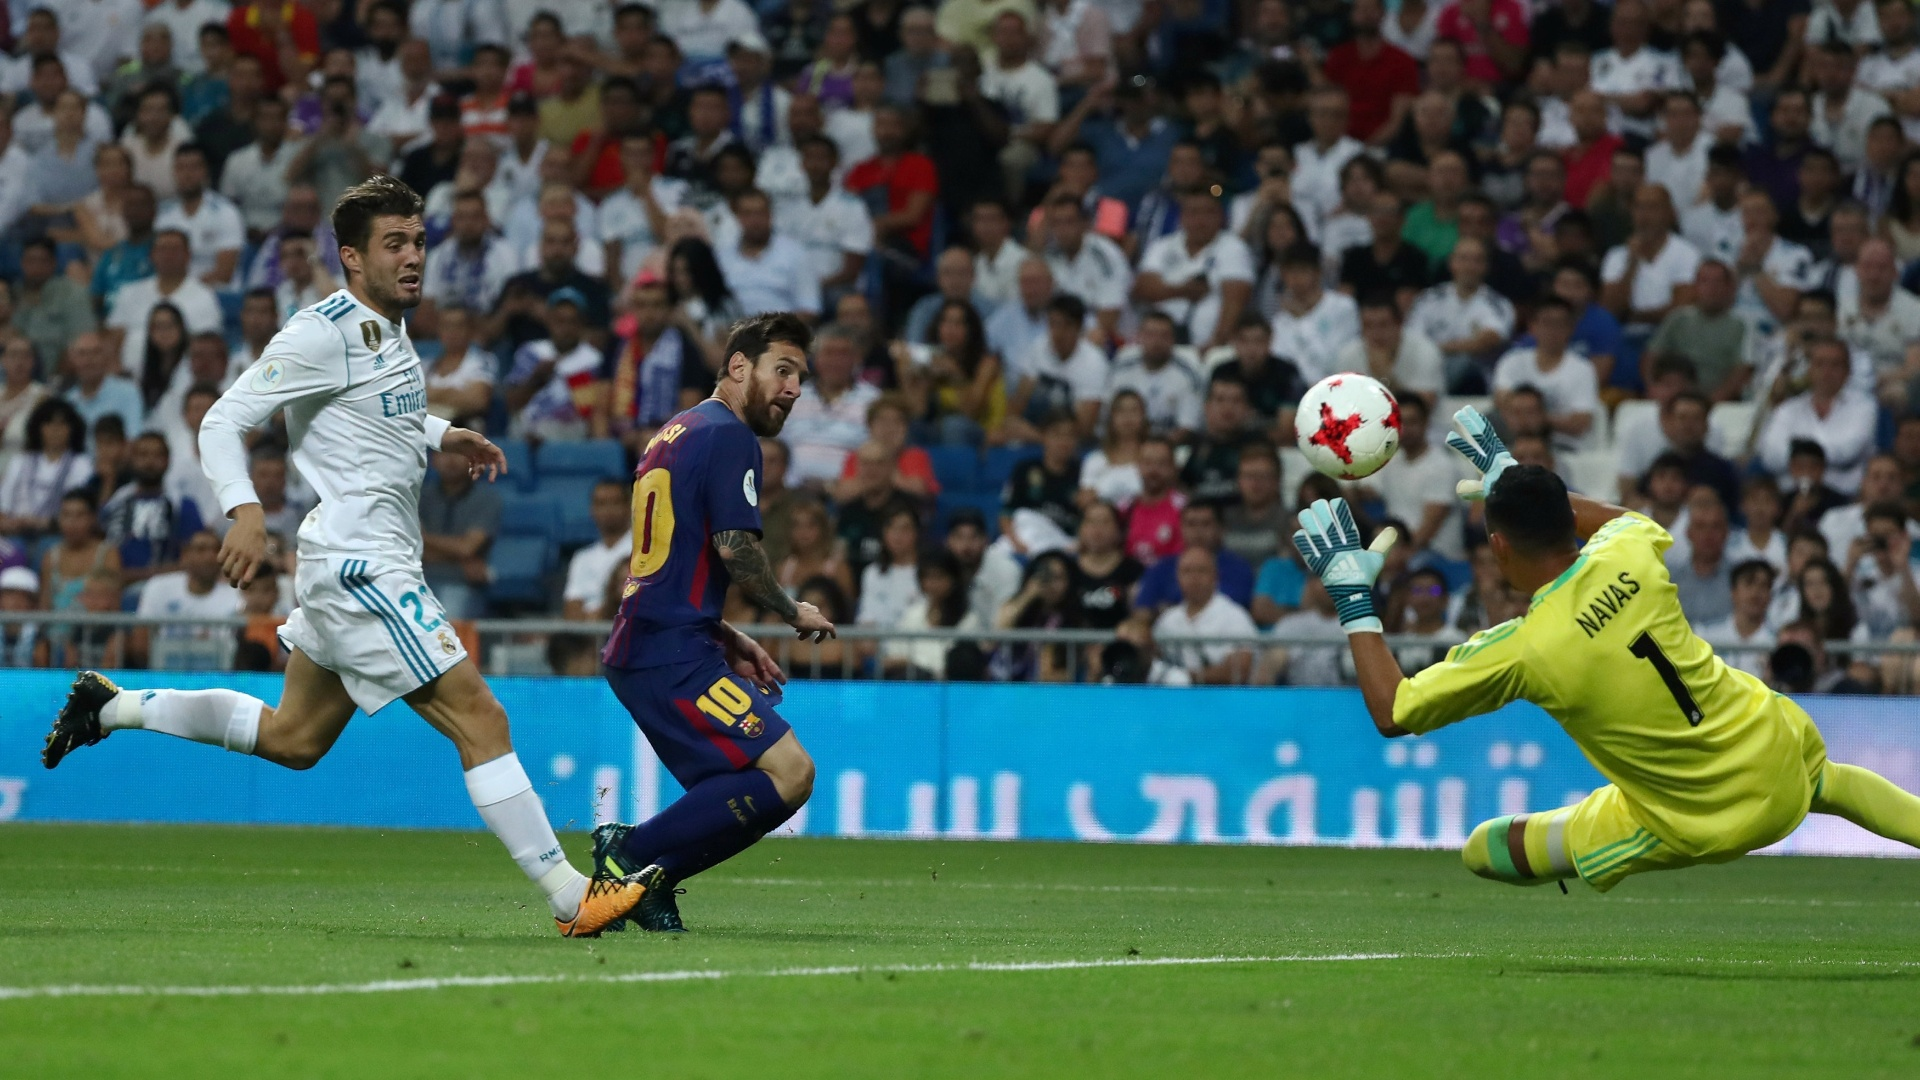 Messi perde gol diante de Keylor Navas em Real Madrid x Barcelona